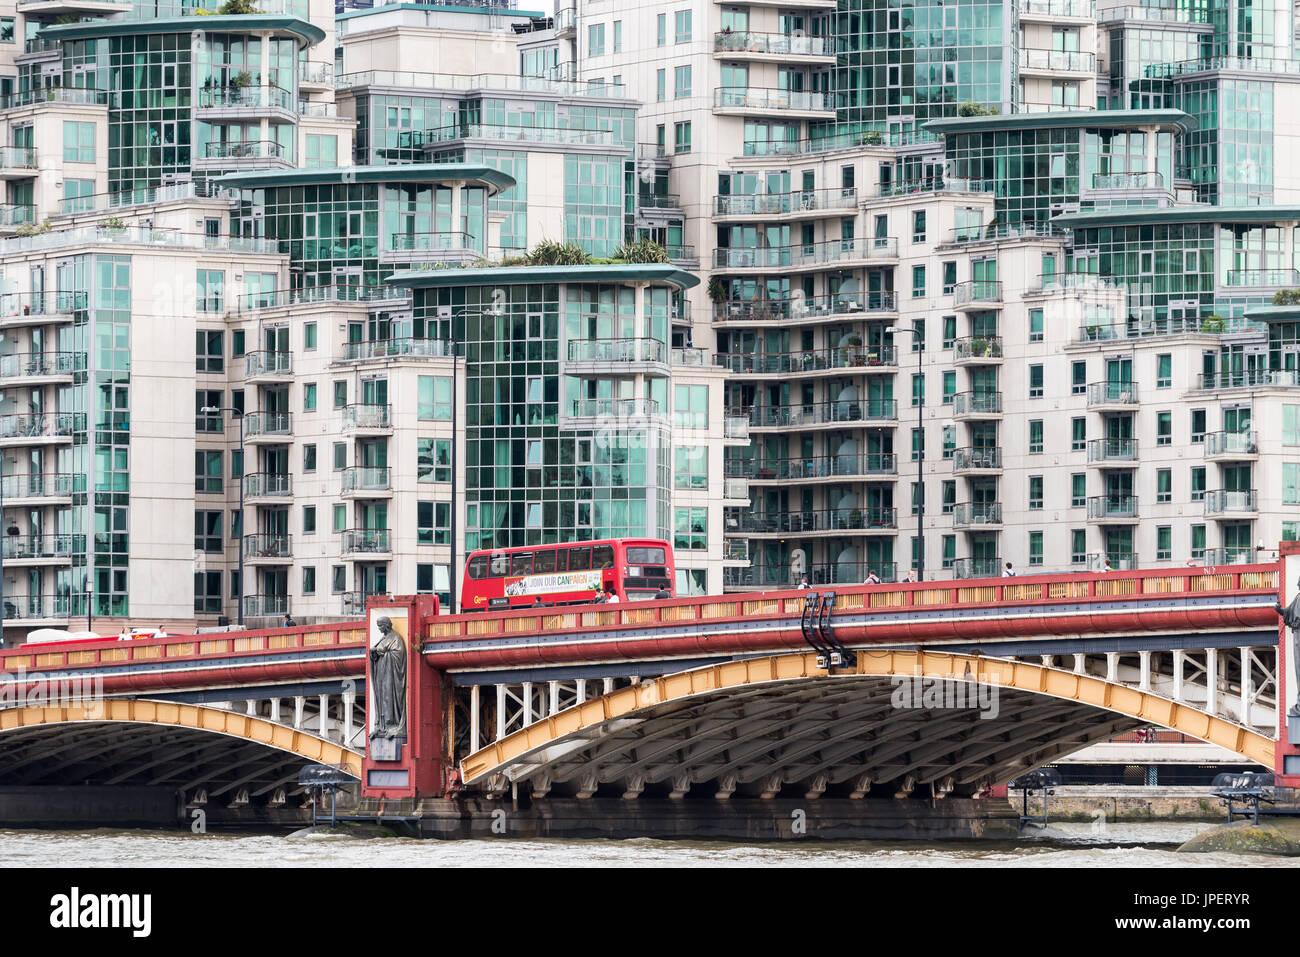 St. George Wharf luxury apartments in Nine Elms London UK - Stock Image